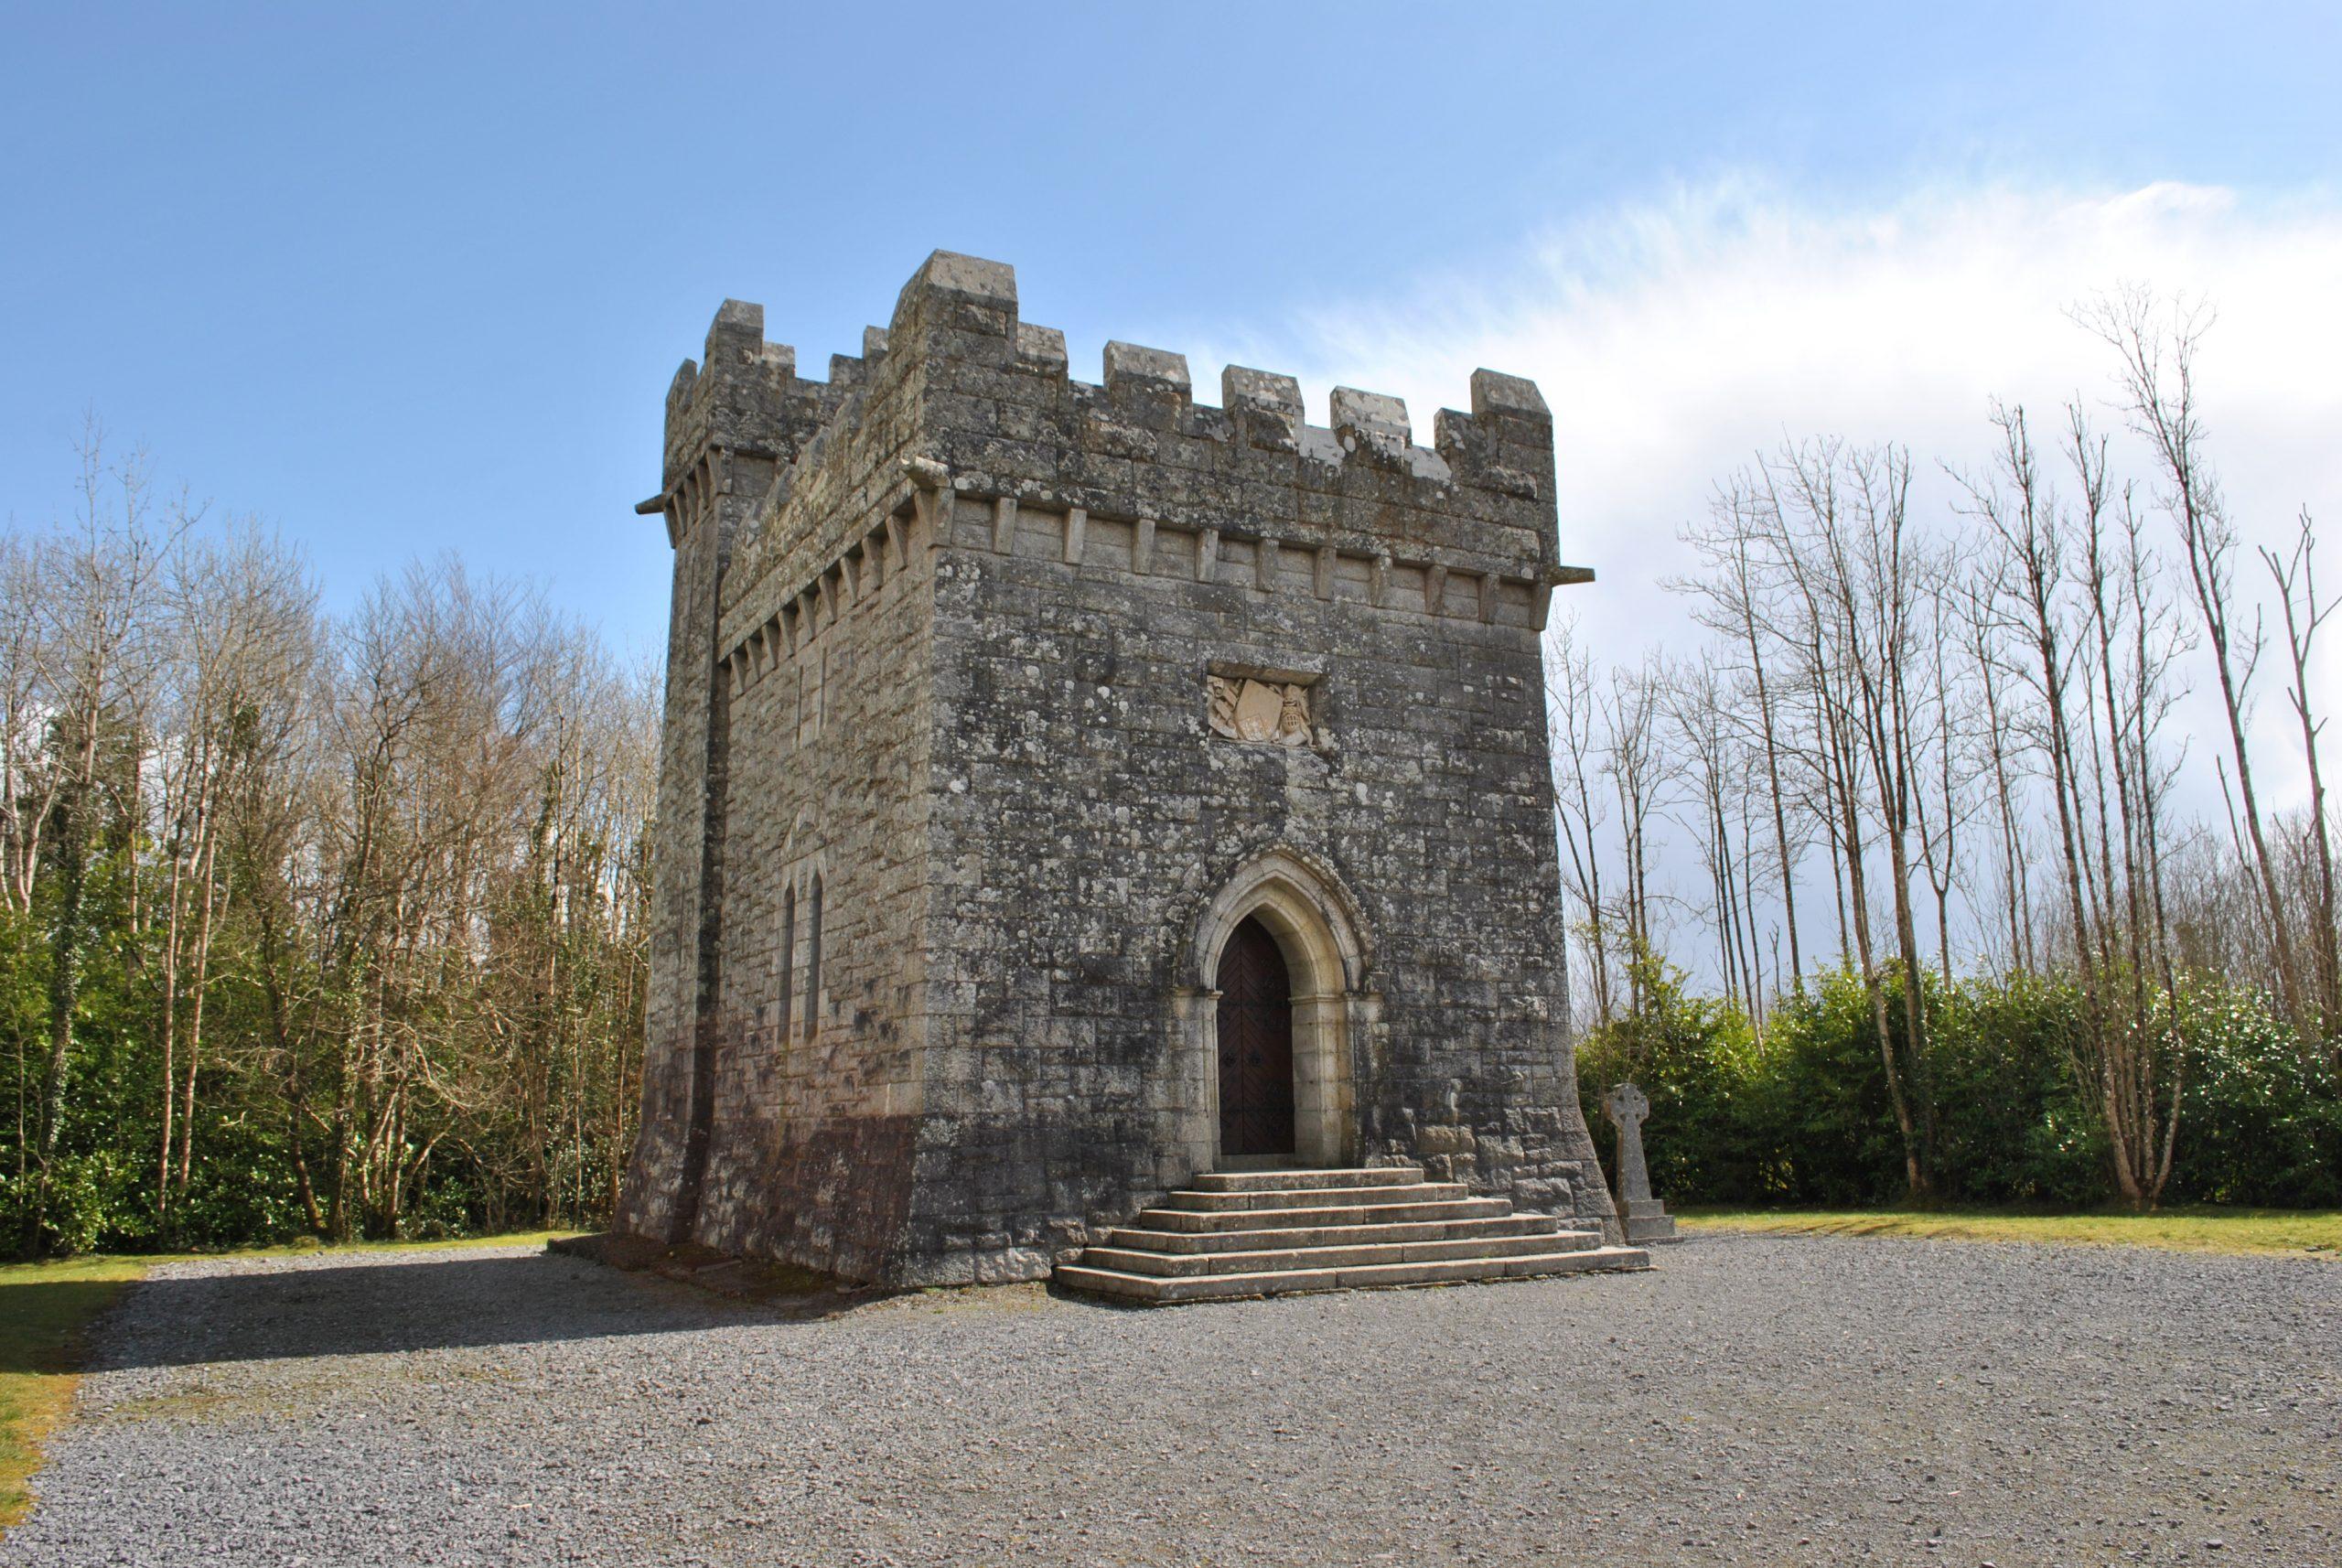 Ffrench Mausoleum in Galway - Visit Galway